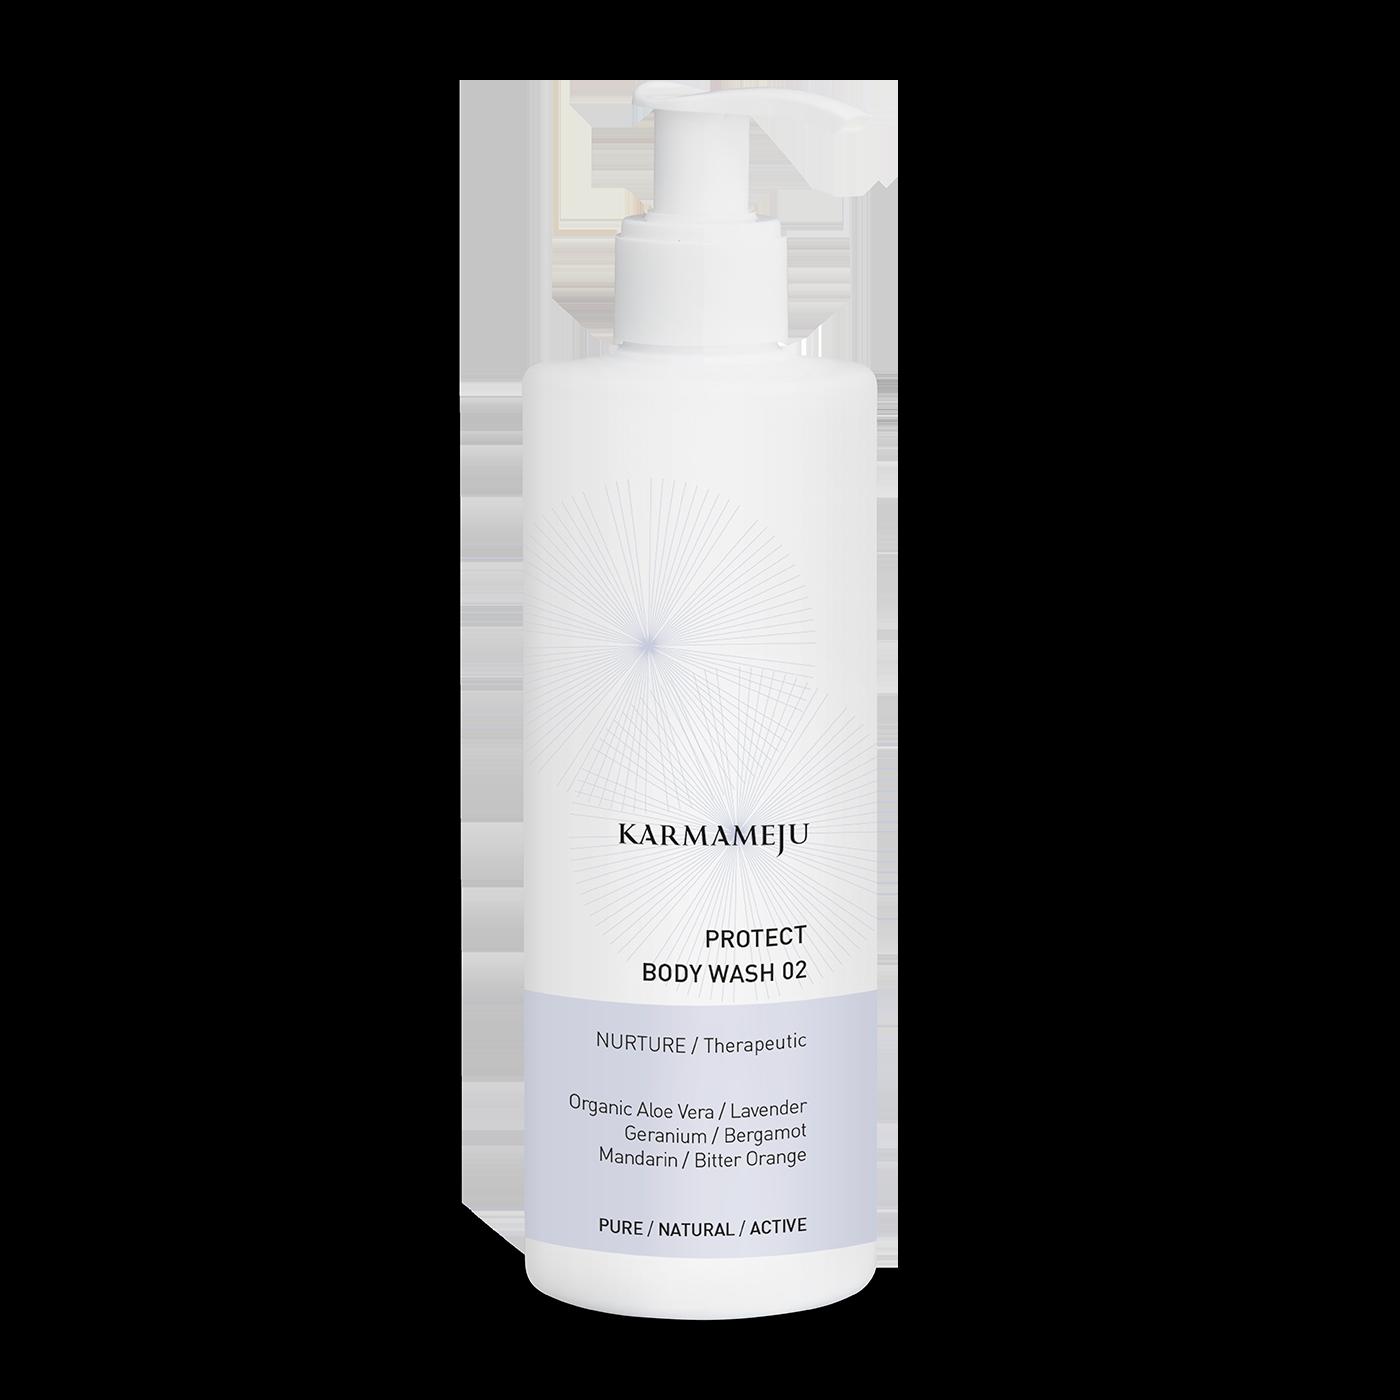 Karmameju PROTECT / BODY WASH 02 - 400 ml